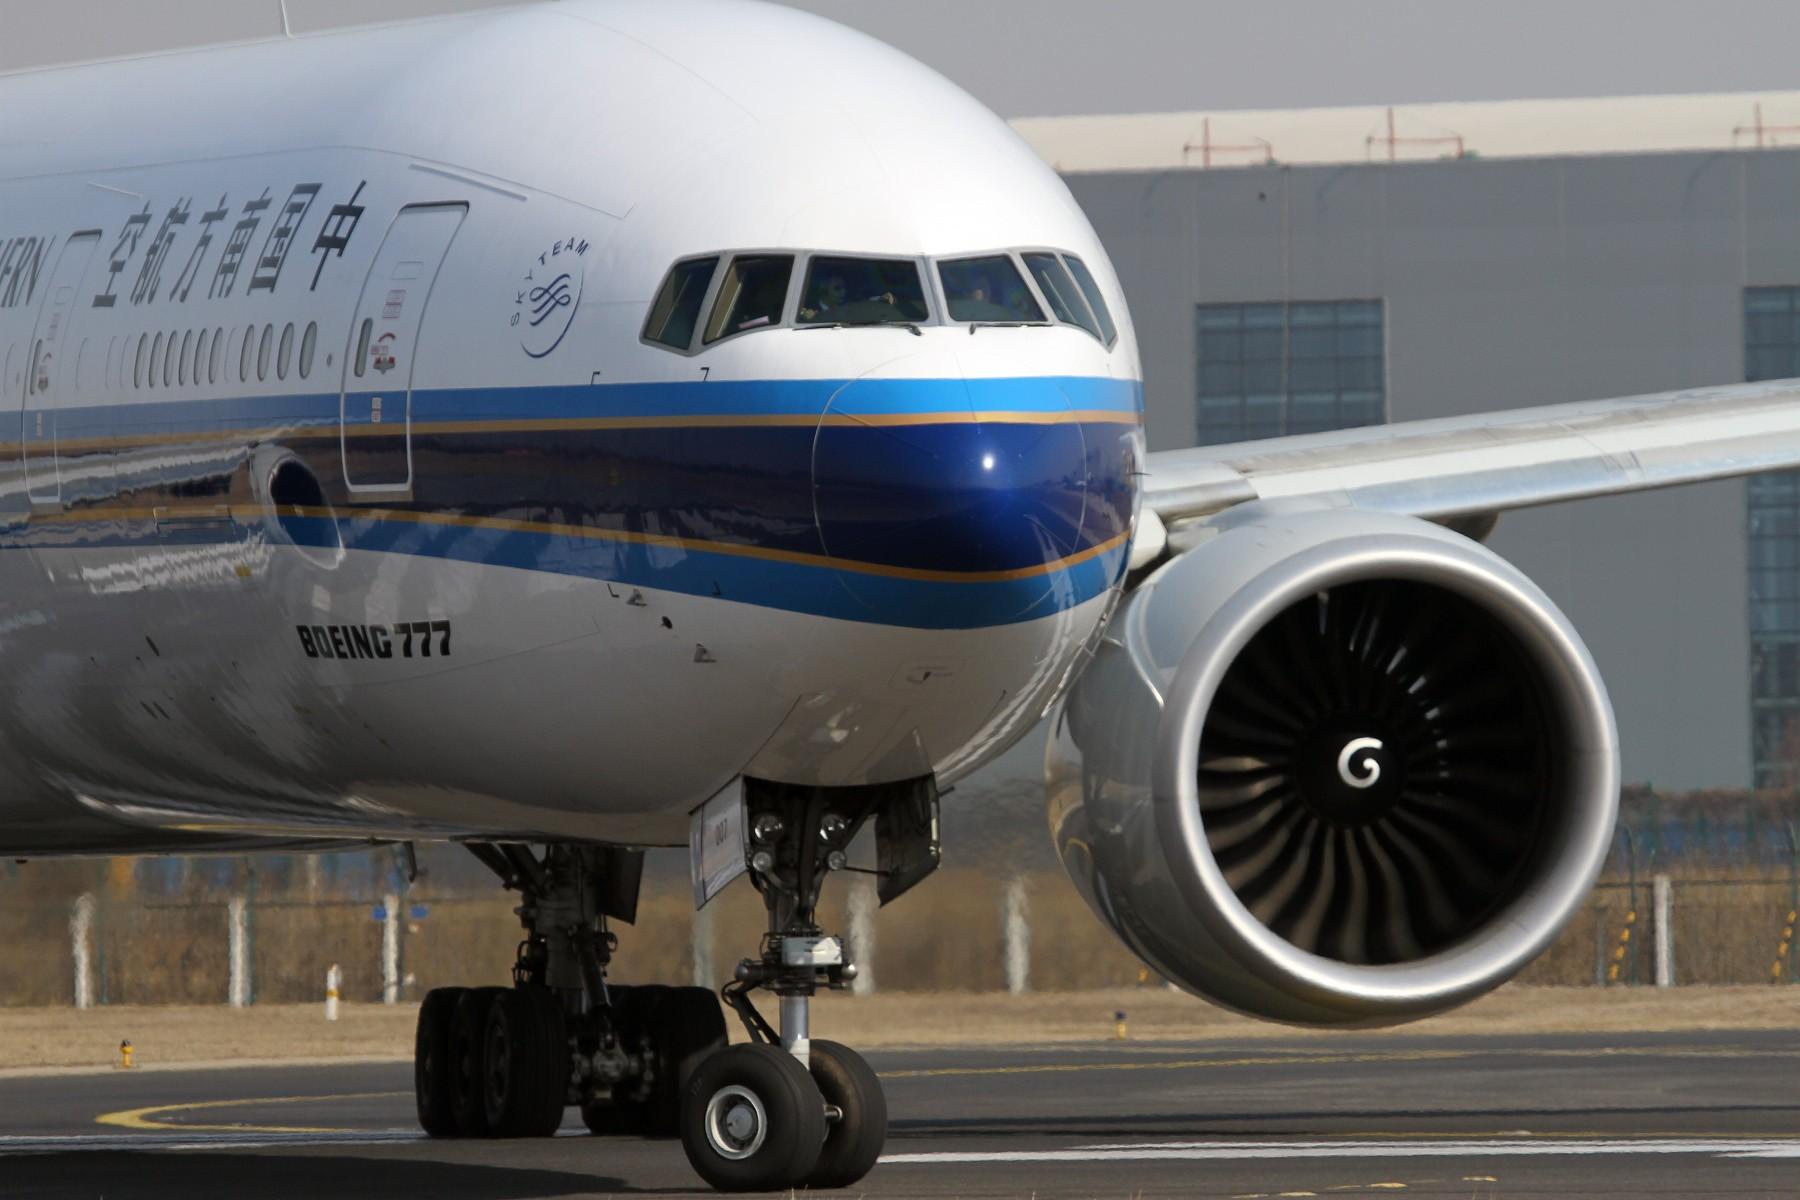 Re:[原创]南方航空Boeing 777-300ER组图。 BOEING 777-300ER B-2007 中国北京首都国际机场